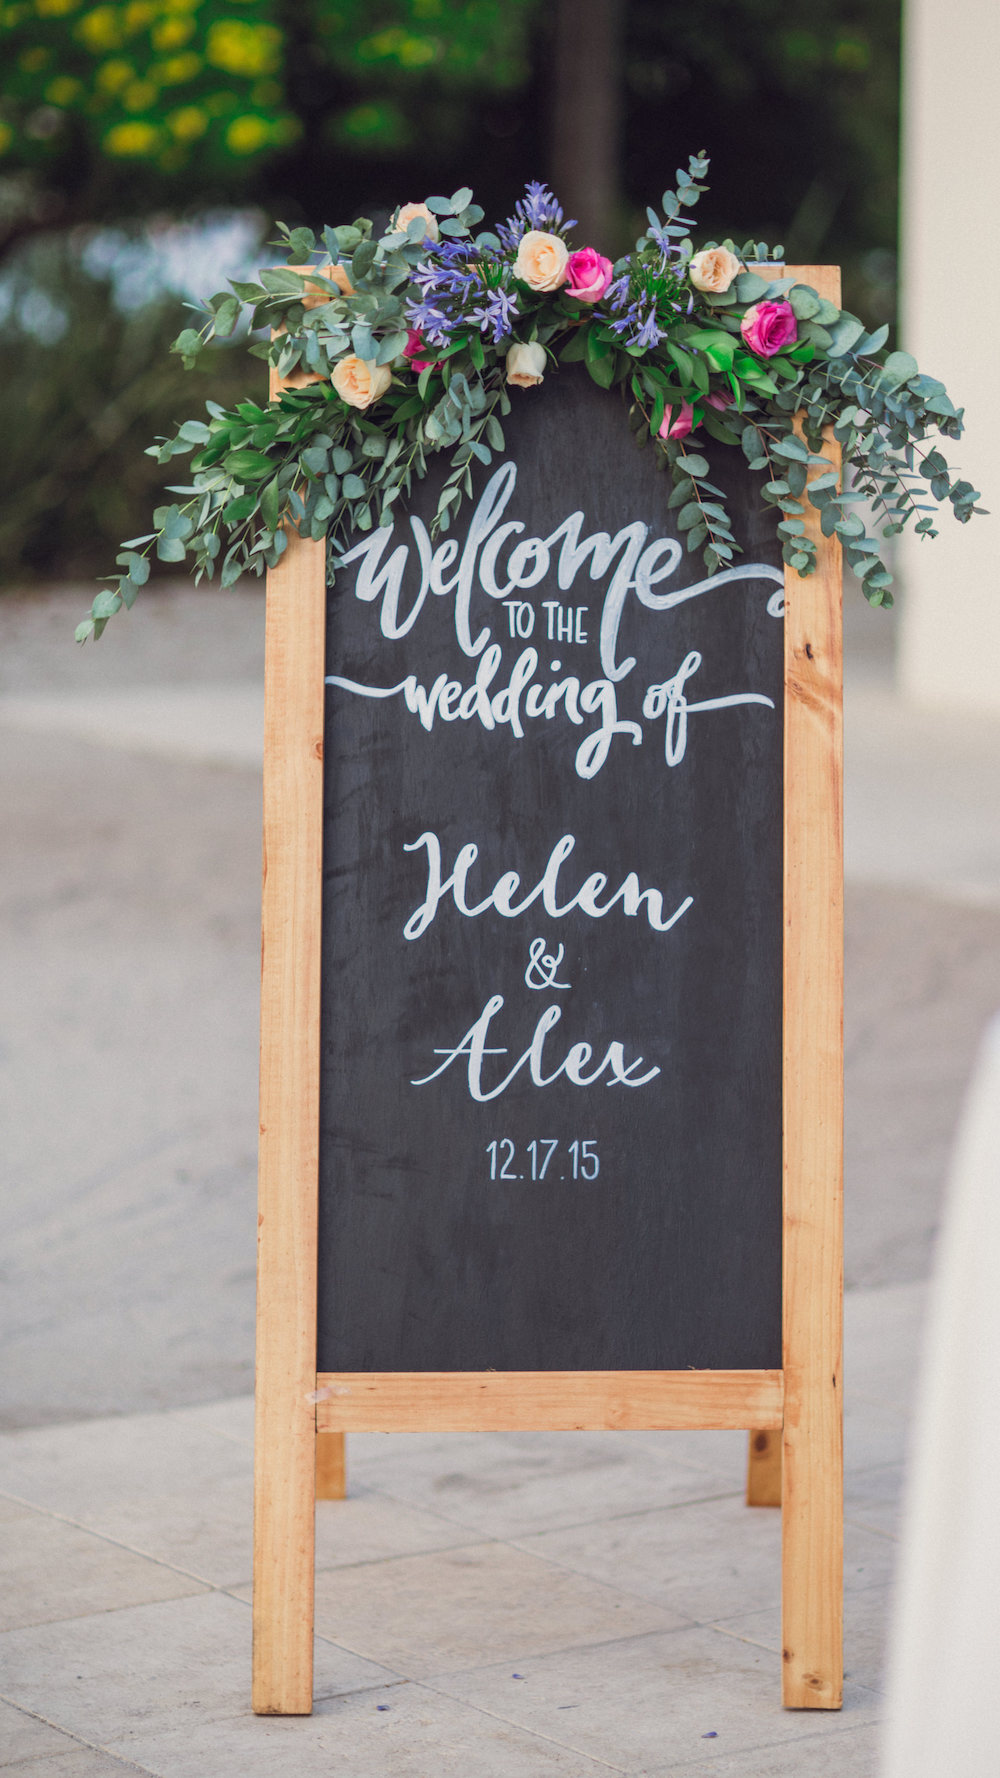 Helen_Alex_Wedding-197.jpg